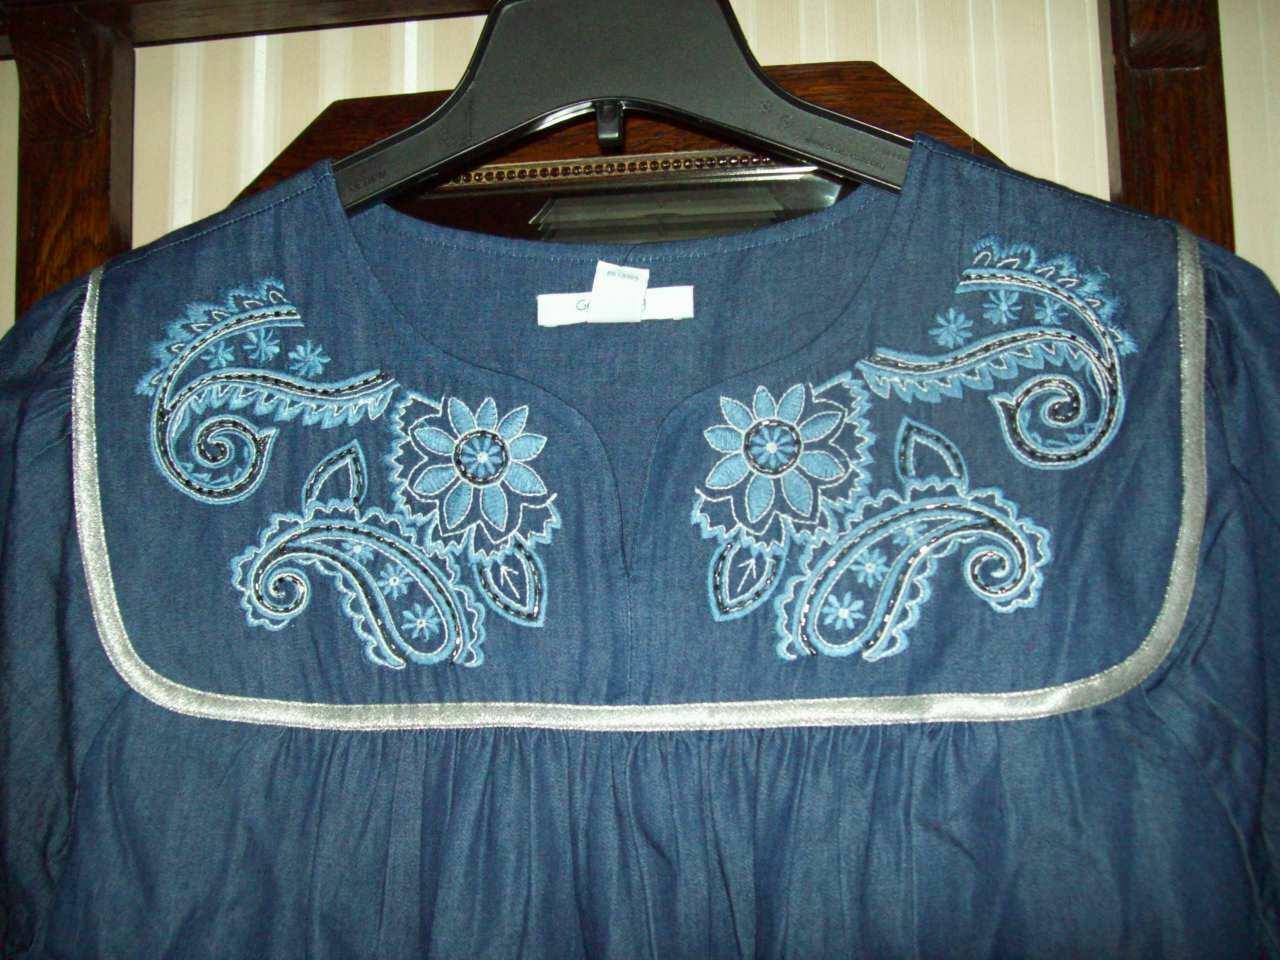 NWT GO SOFTLY 100% COTTON DK DENIM PATIO MUU HOUSE DRESS Blau PAISLEY EMB  L XL